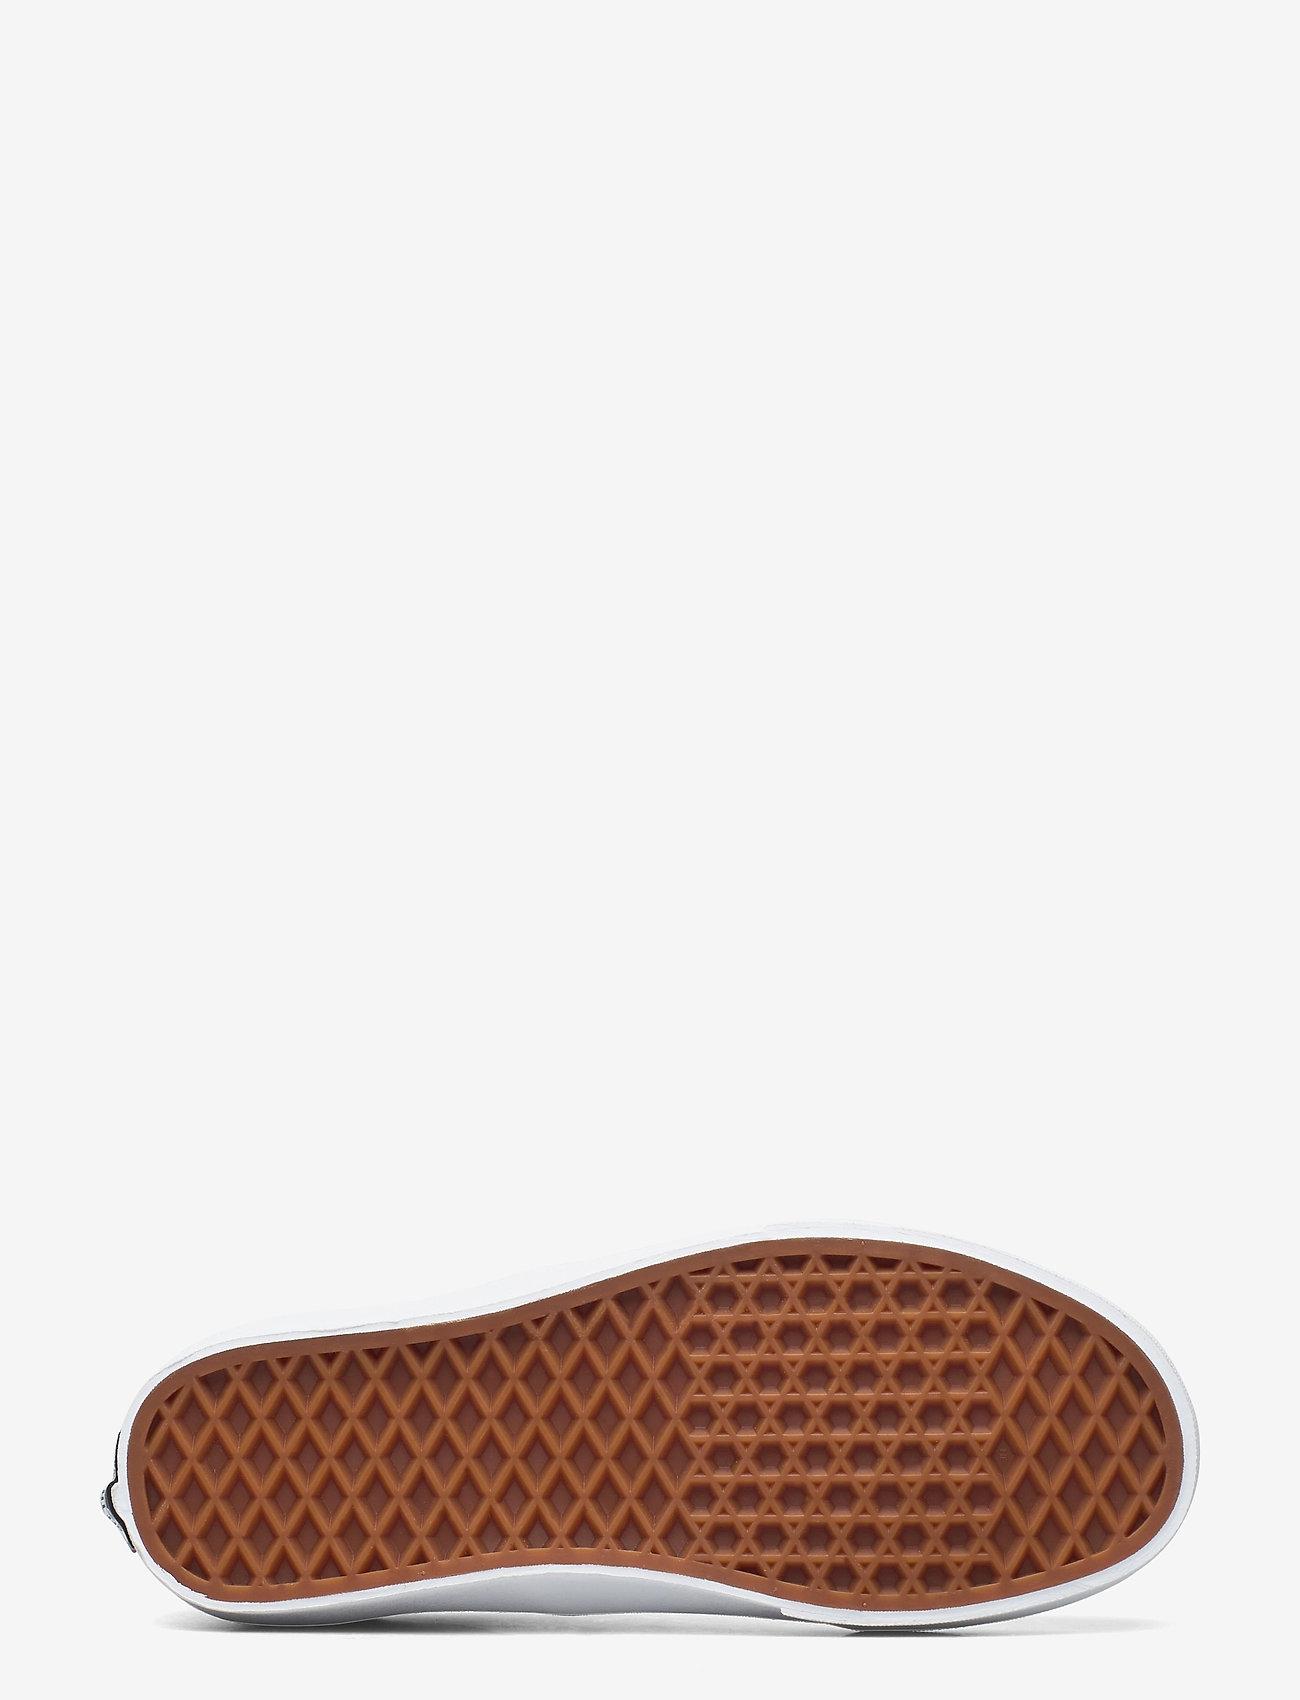 Ua Authentic ((leather) Truewht/truewht) (80 €) - VANS OhxoI